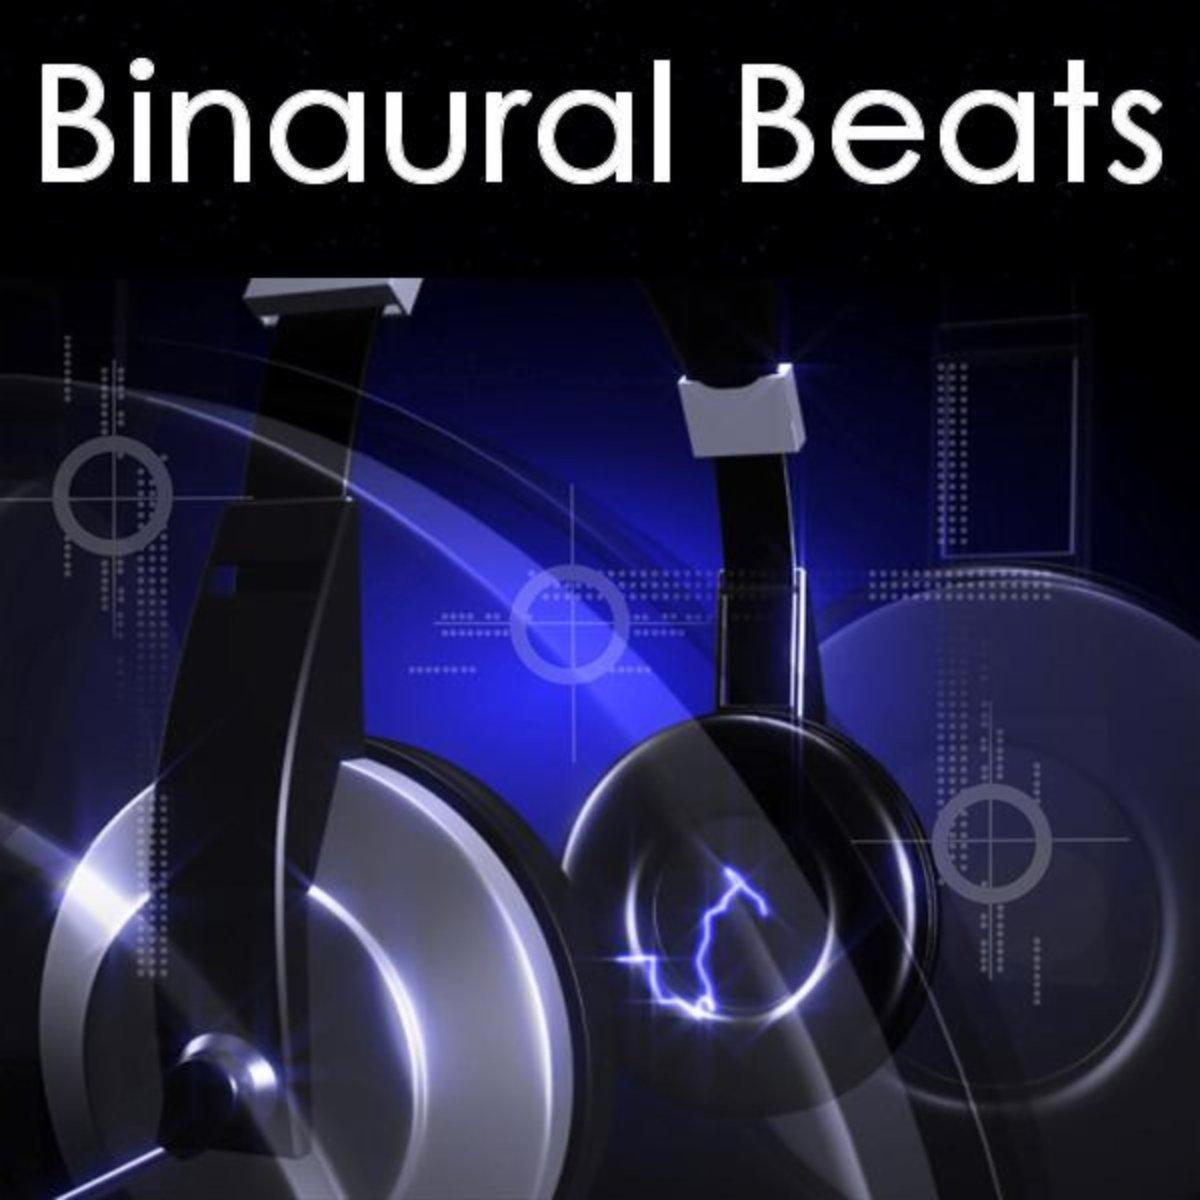 Binaural Beats